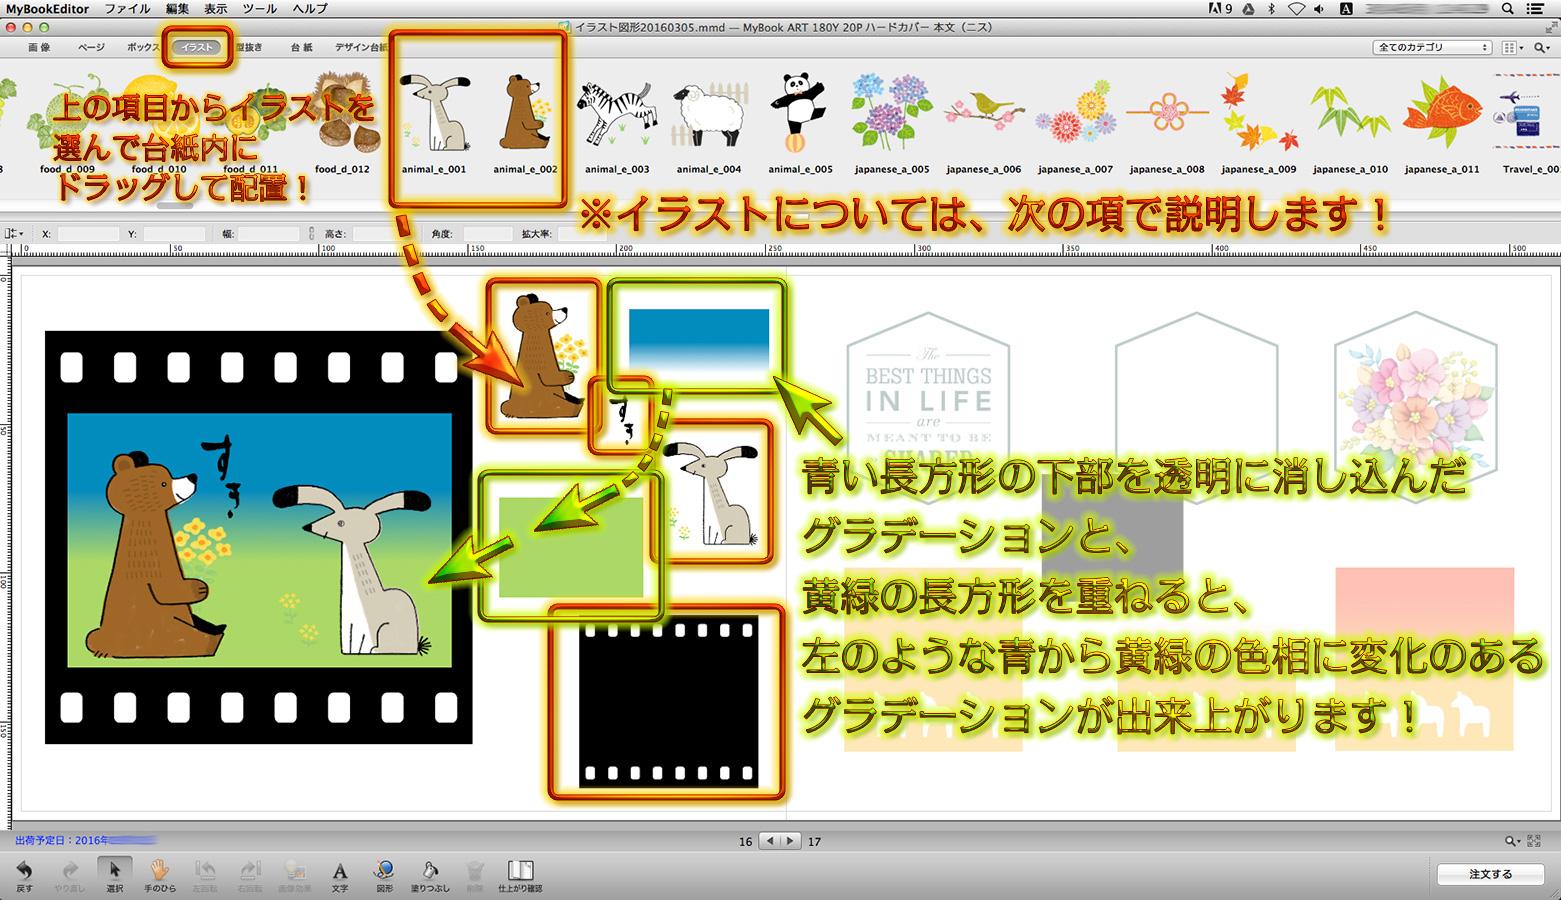 http://moritetsu.info/car/img/mb096new-2016-03-14-11-45-29.jpg